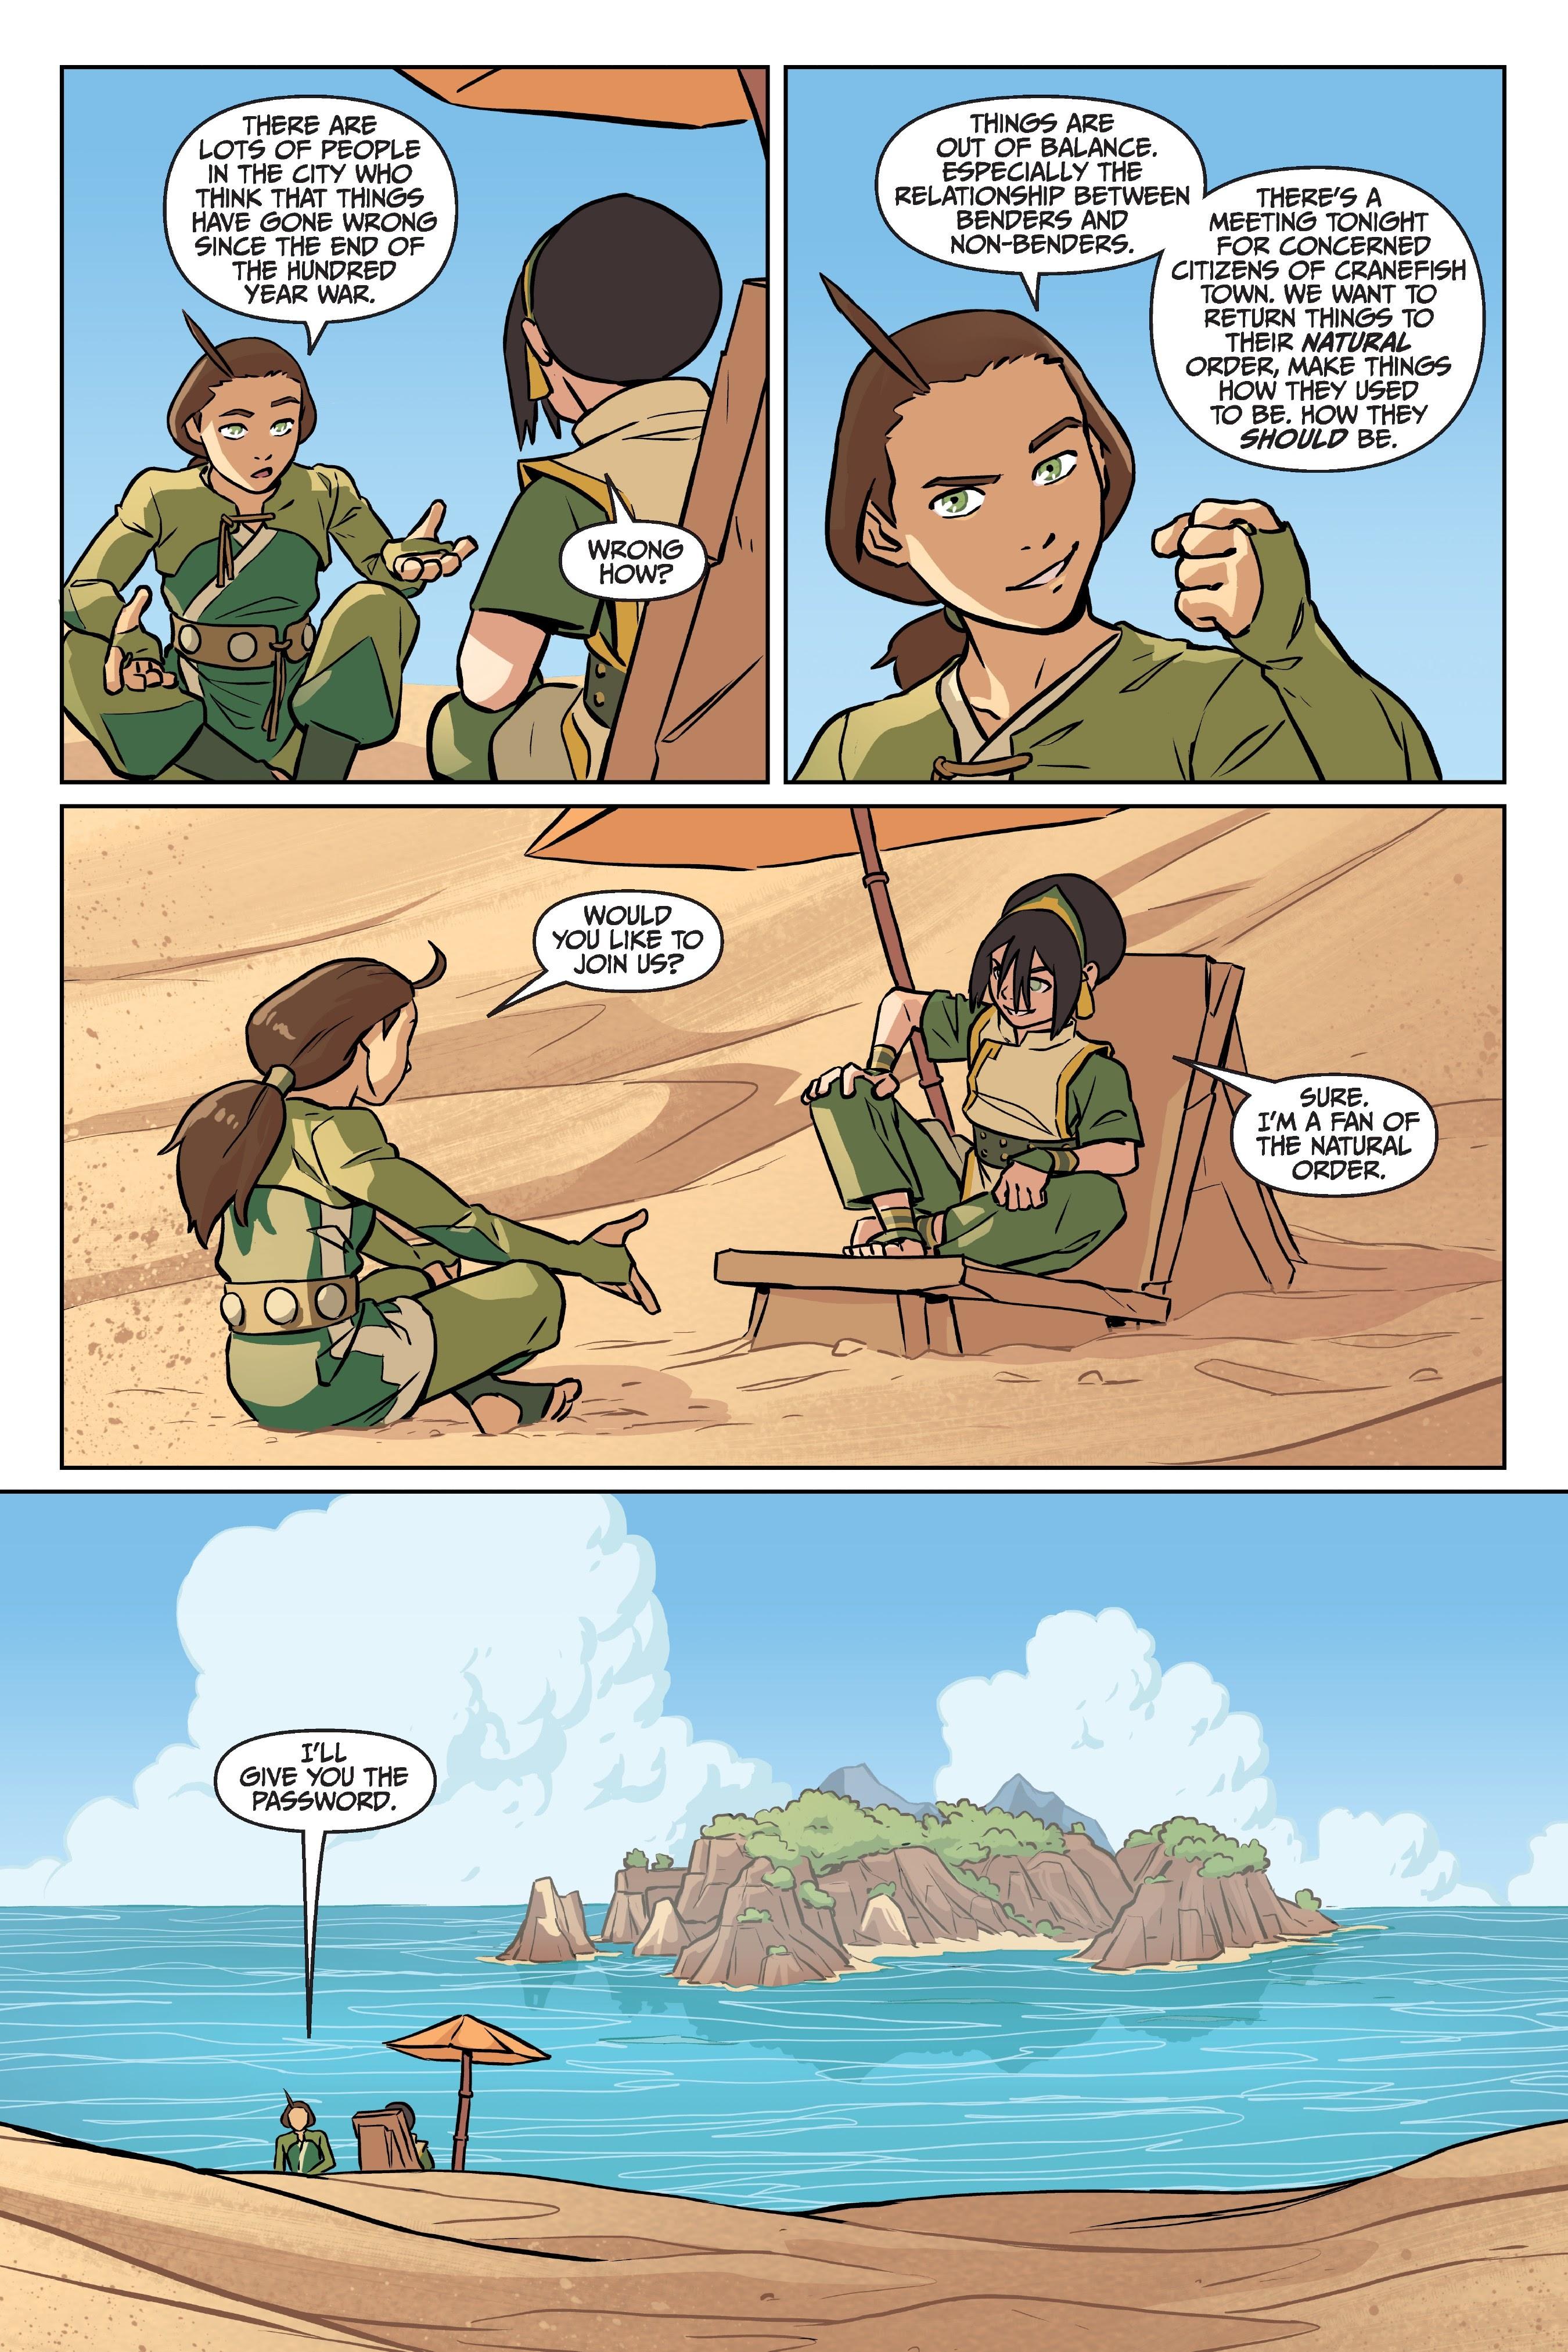 Nickelodeon Avatar: The Last Airbender - Imbalance TPB_2 Page 36